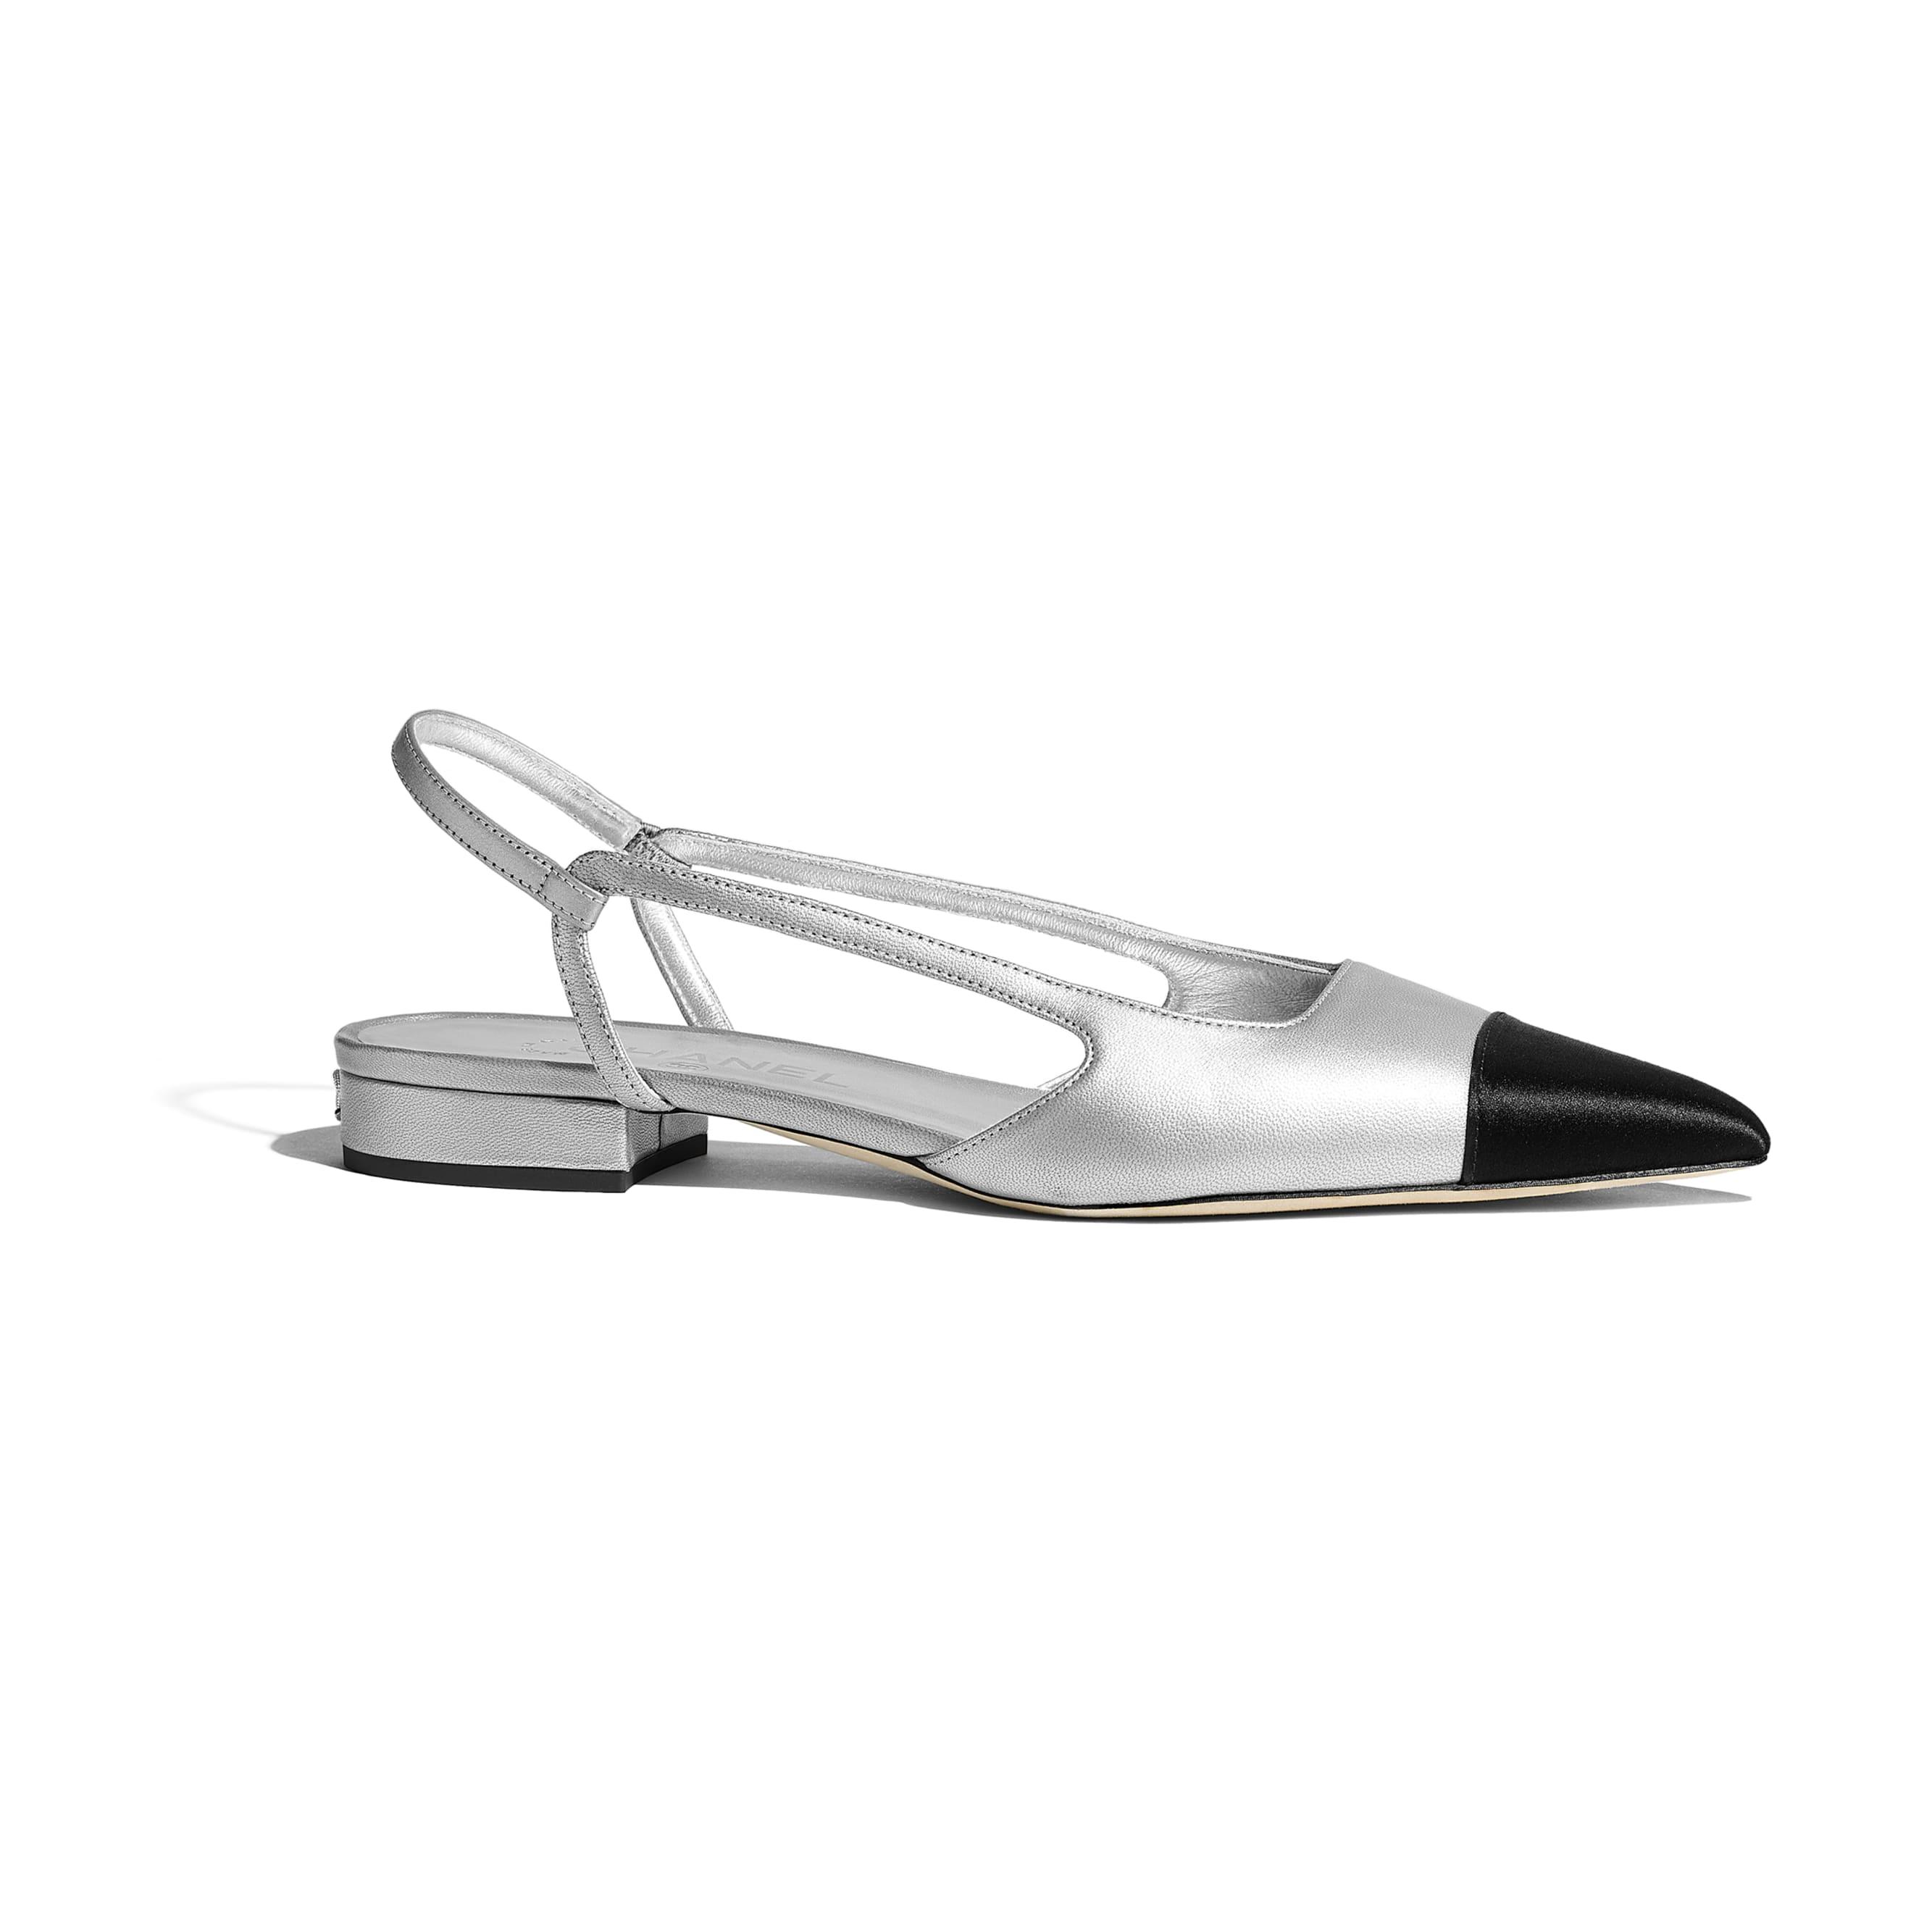 Sling-Back - Silver & Black - Metallic Lambskin & Satin - CHANEL - Default view - see standard sized version